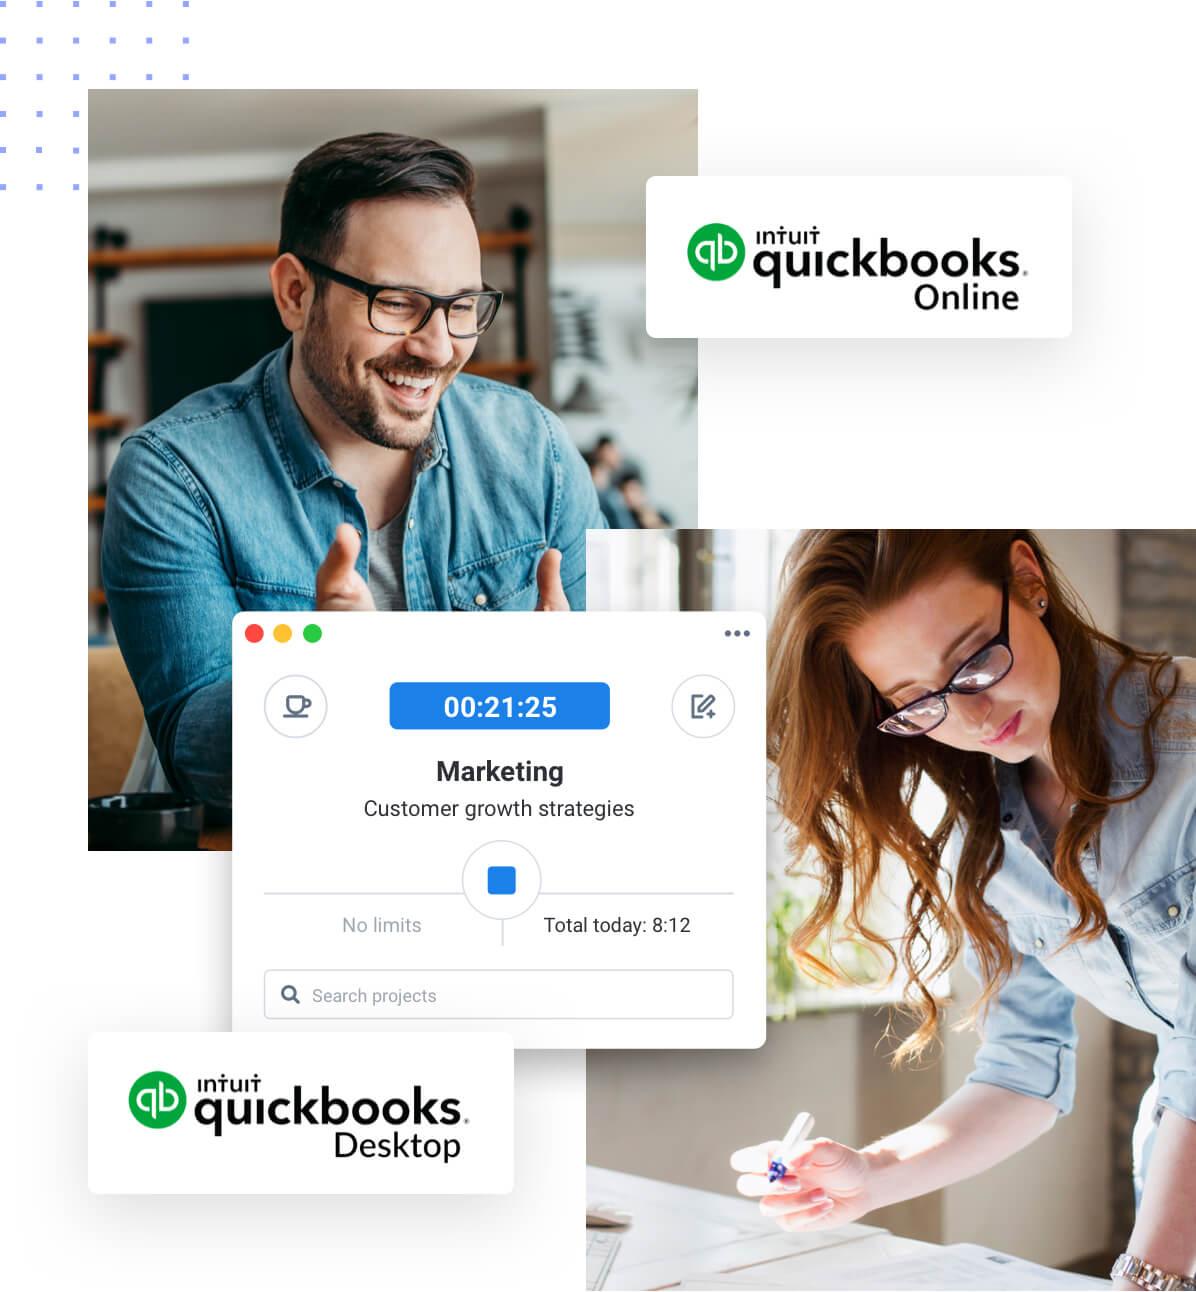 Support for Quickbooks Online and Desktop